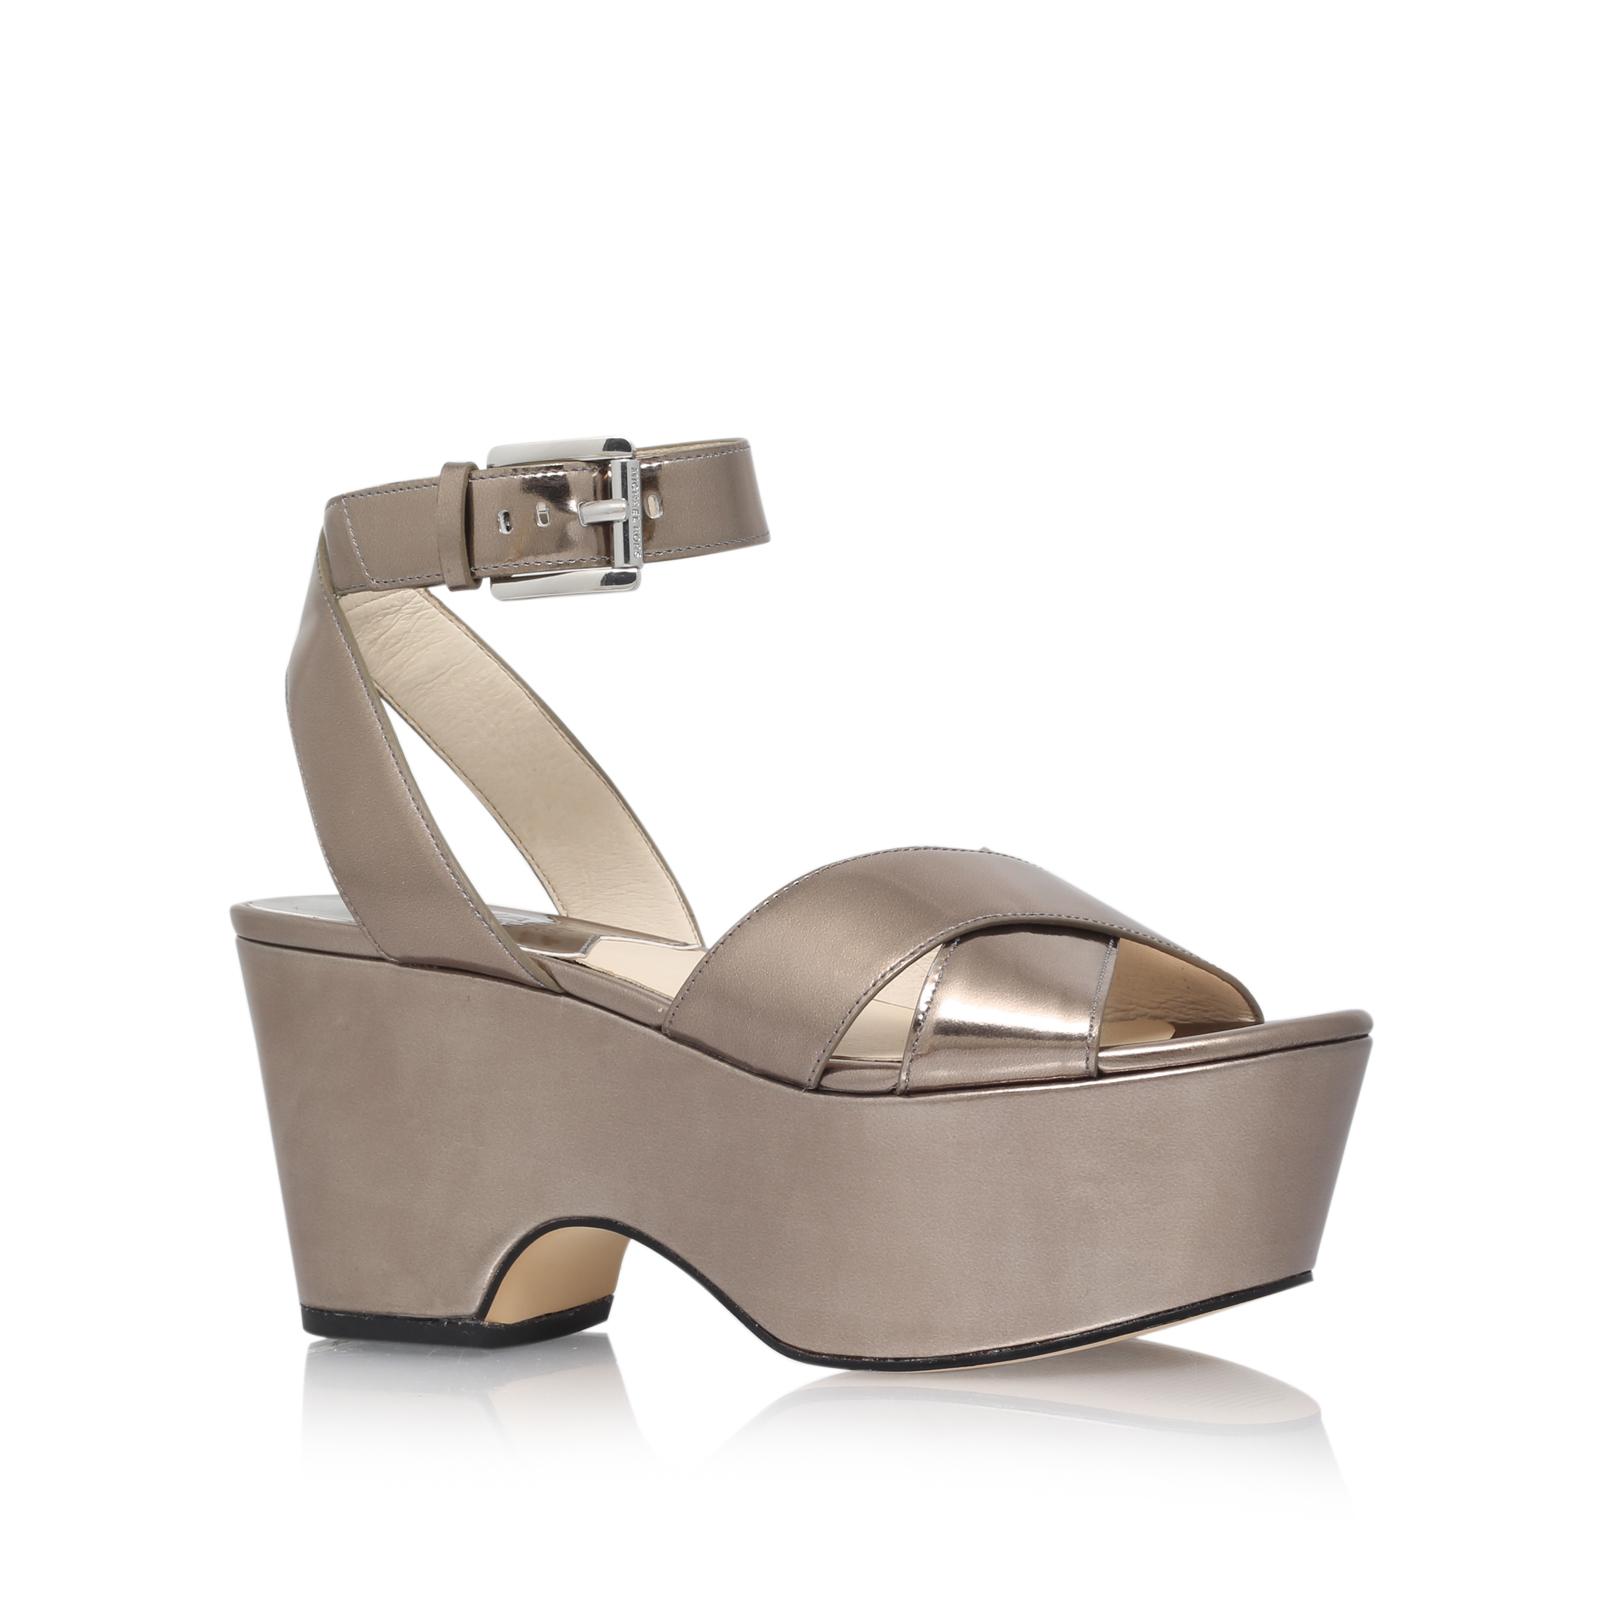 372c8ea0b49 ARIEL MID WEDGE Michael Michael Kors Ariel Grey Leather Wedge Sandals by MICHAEL  MICHAEL KORS